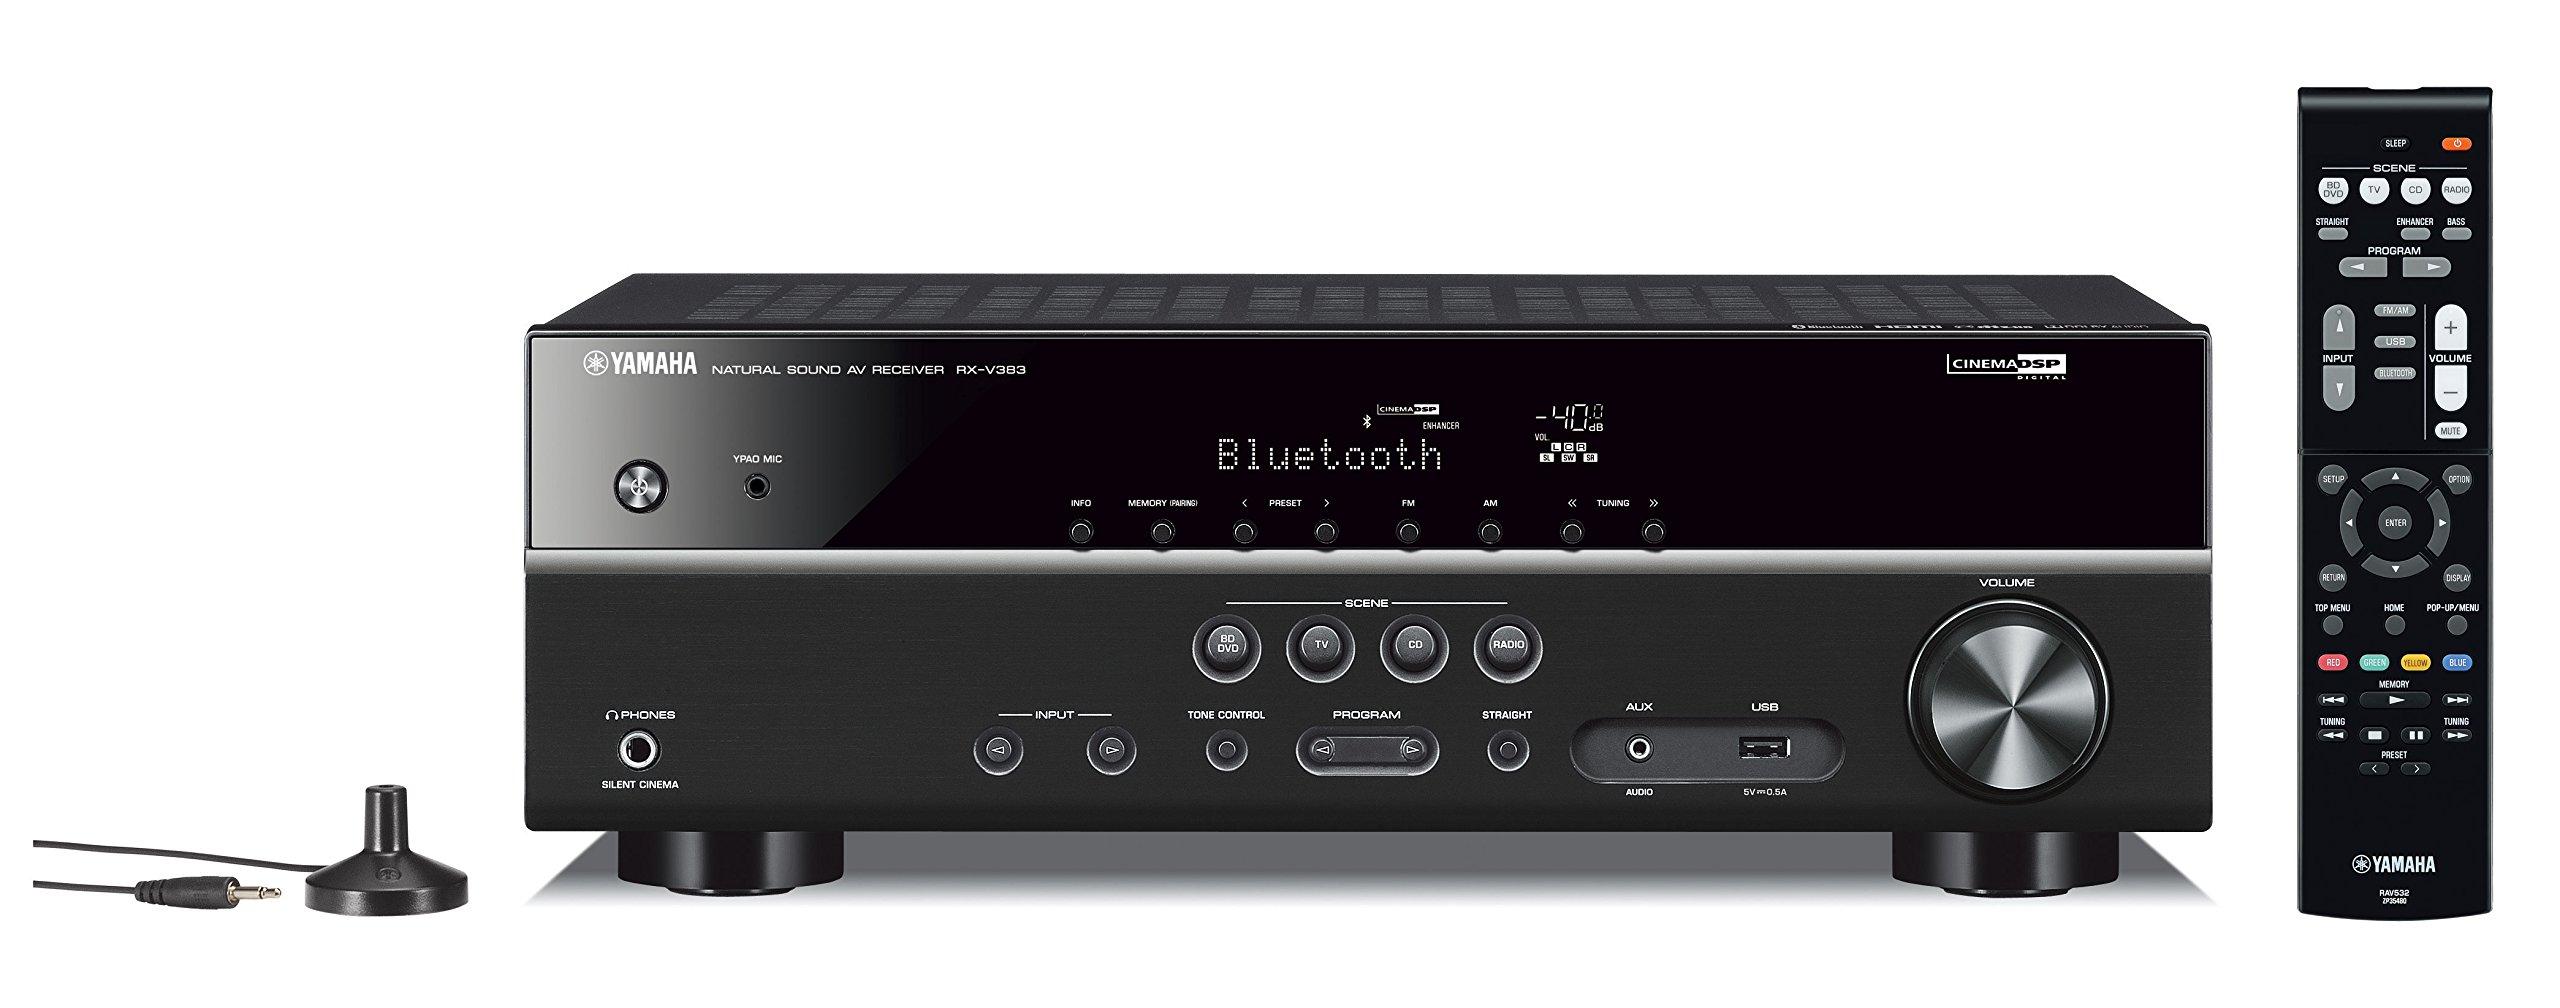 Yamaha RX-V383BL 5.1-Channel 4K Ultra HD AV Receiver with Bluetooth by Yamaha